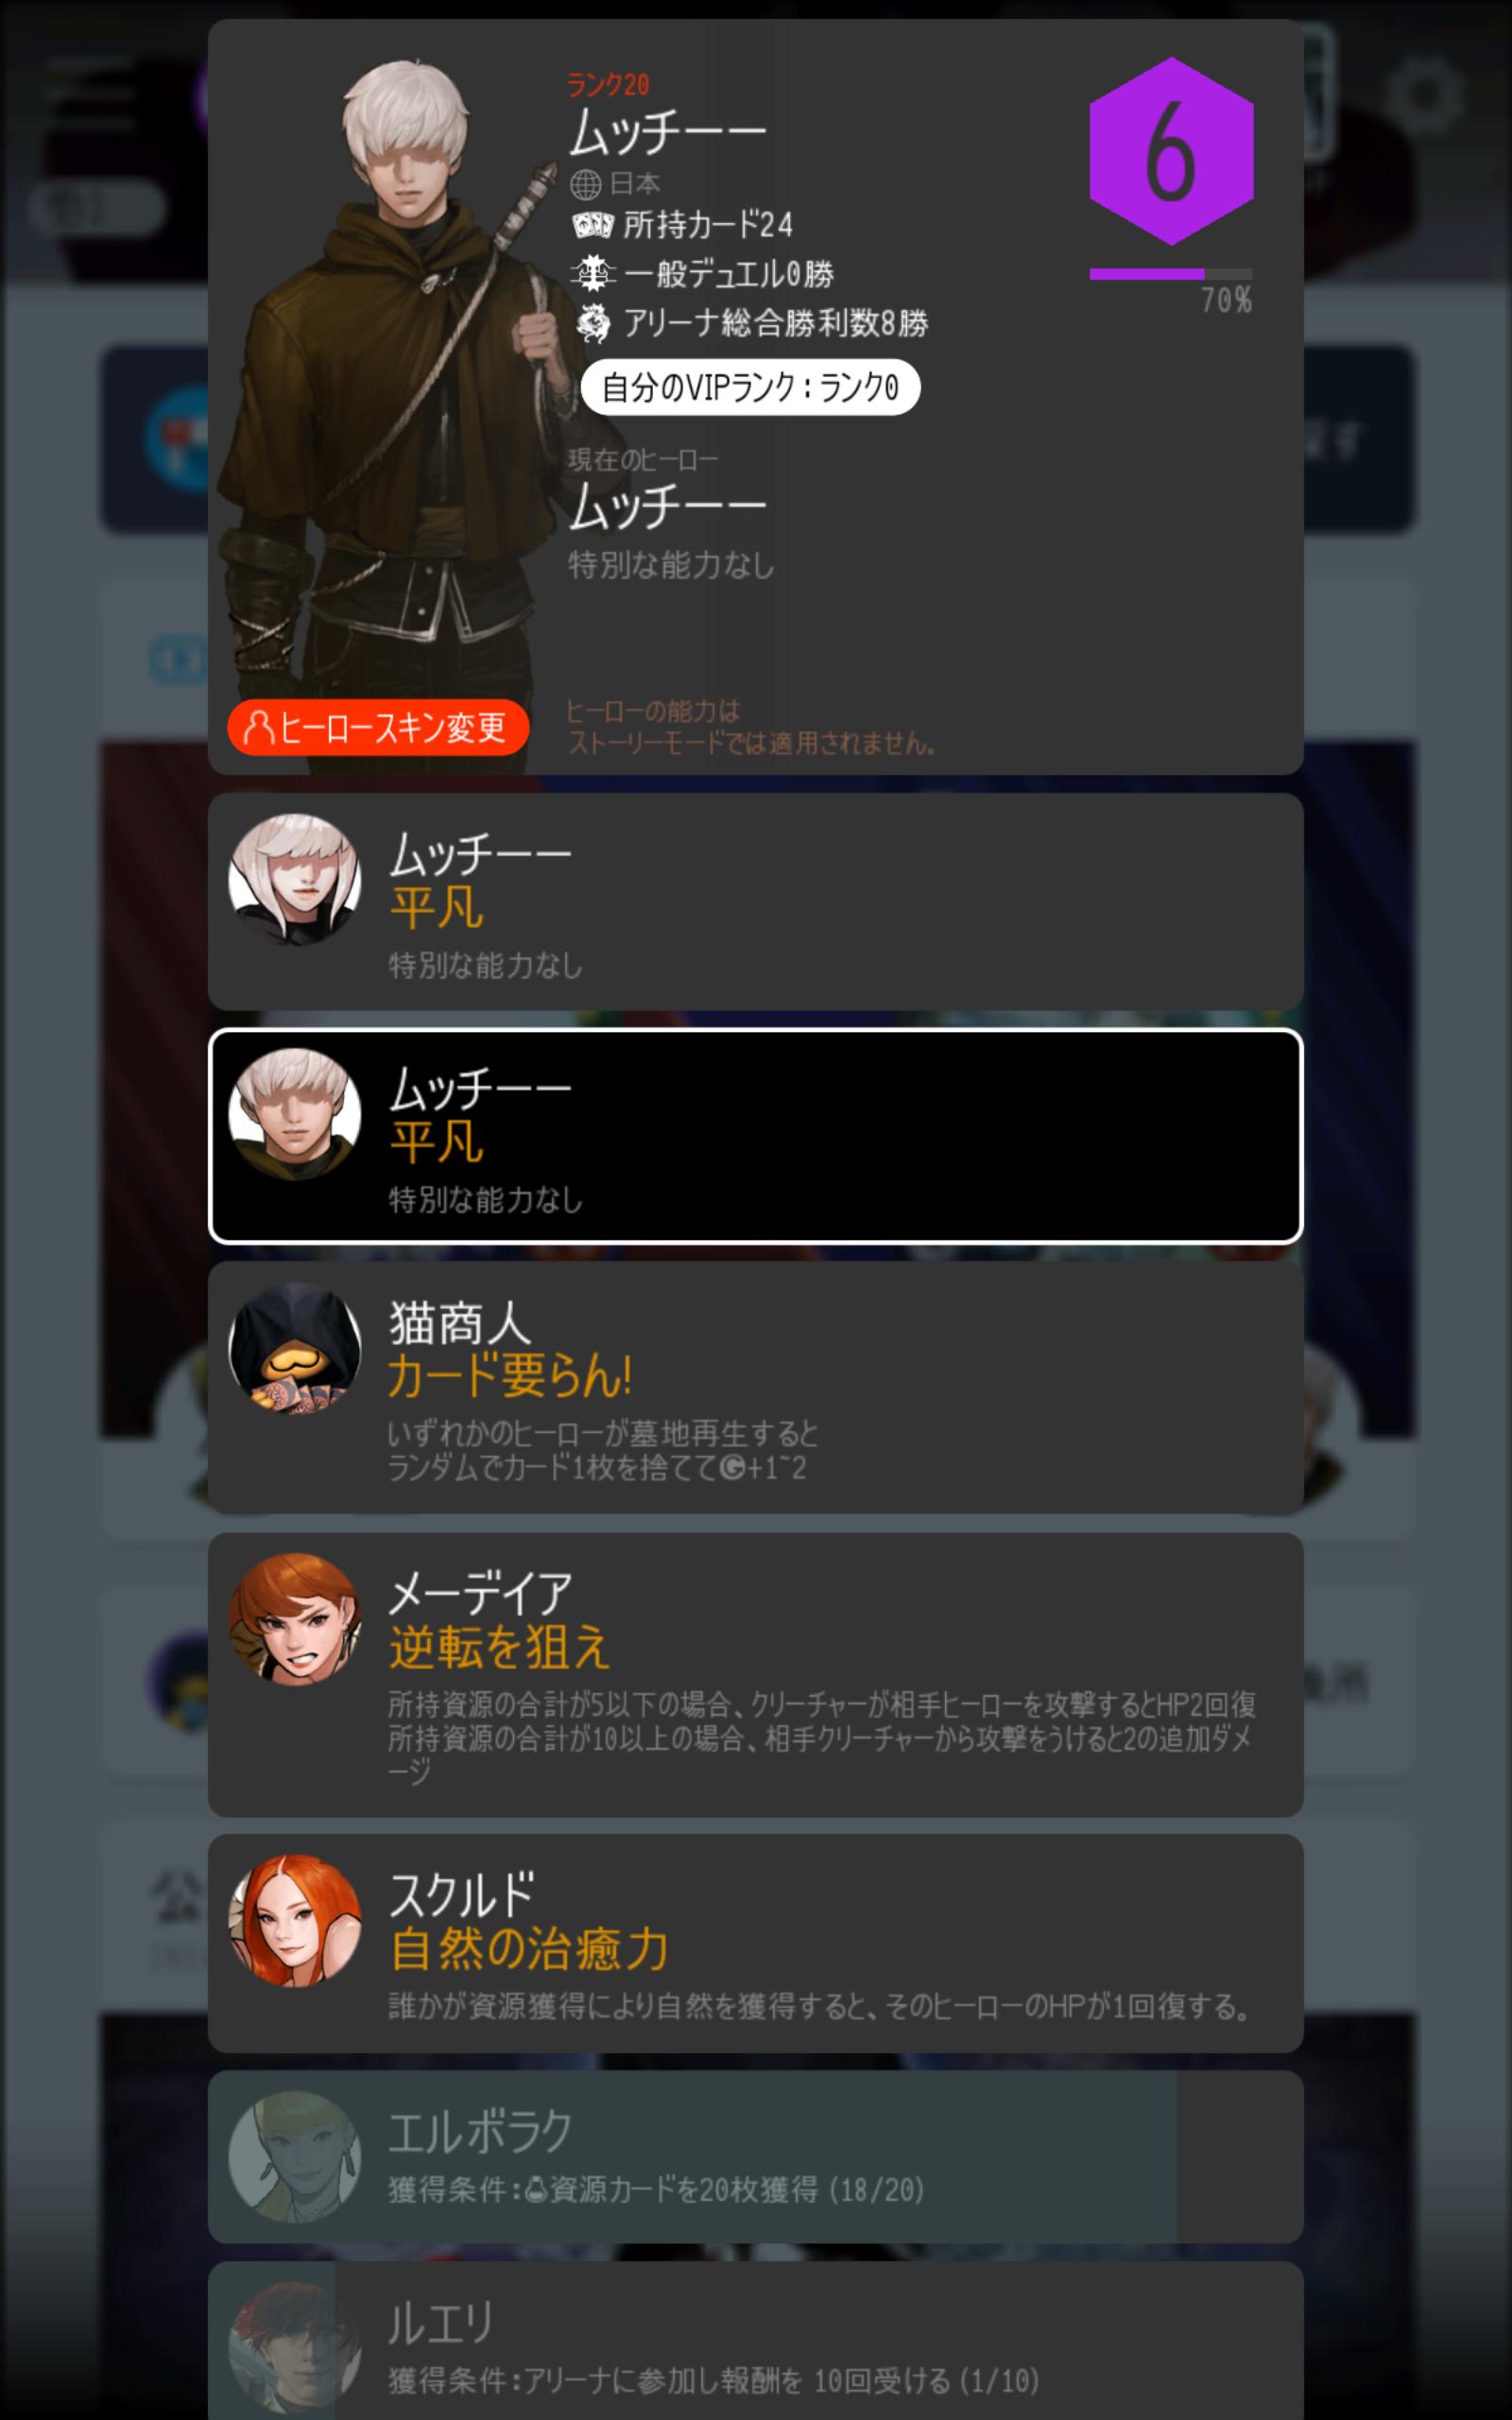 Screenshot_2018-01-26-23-45-44.png